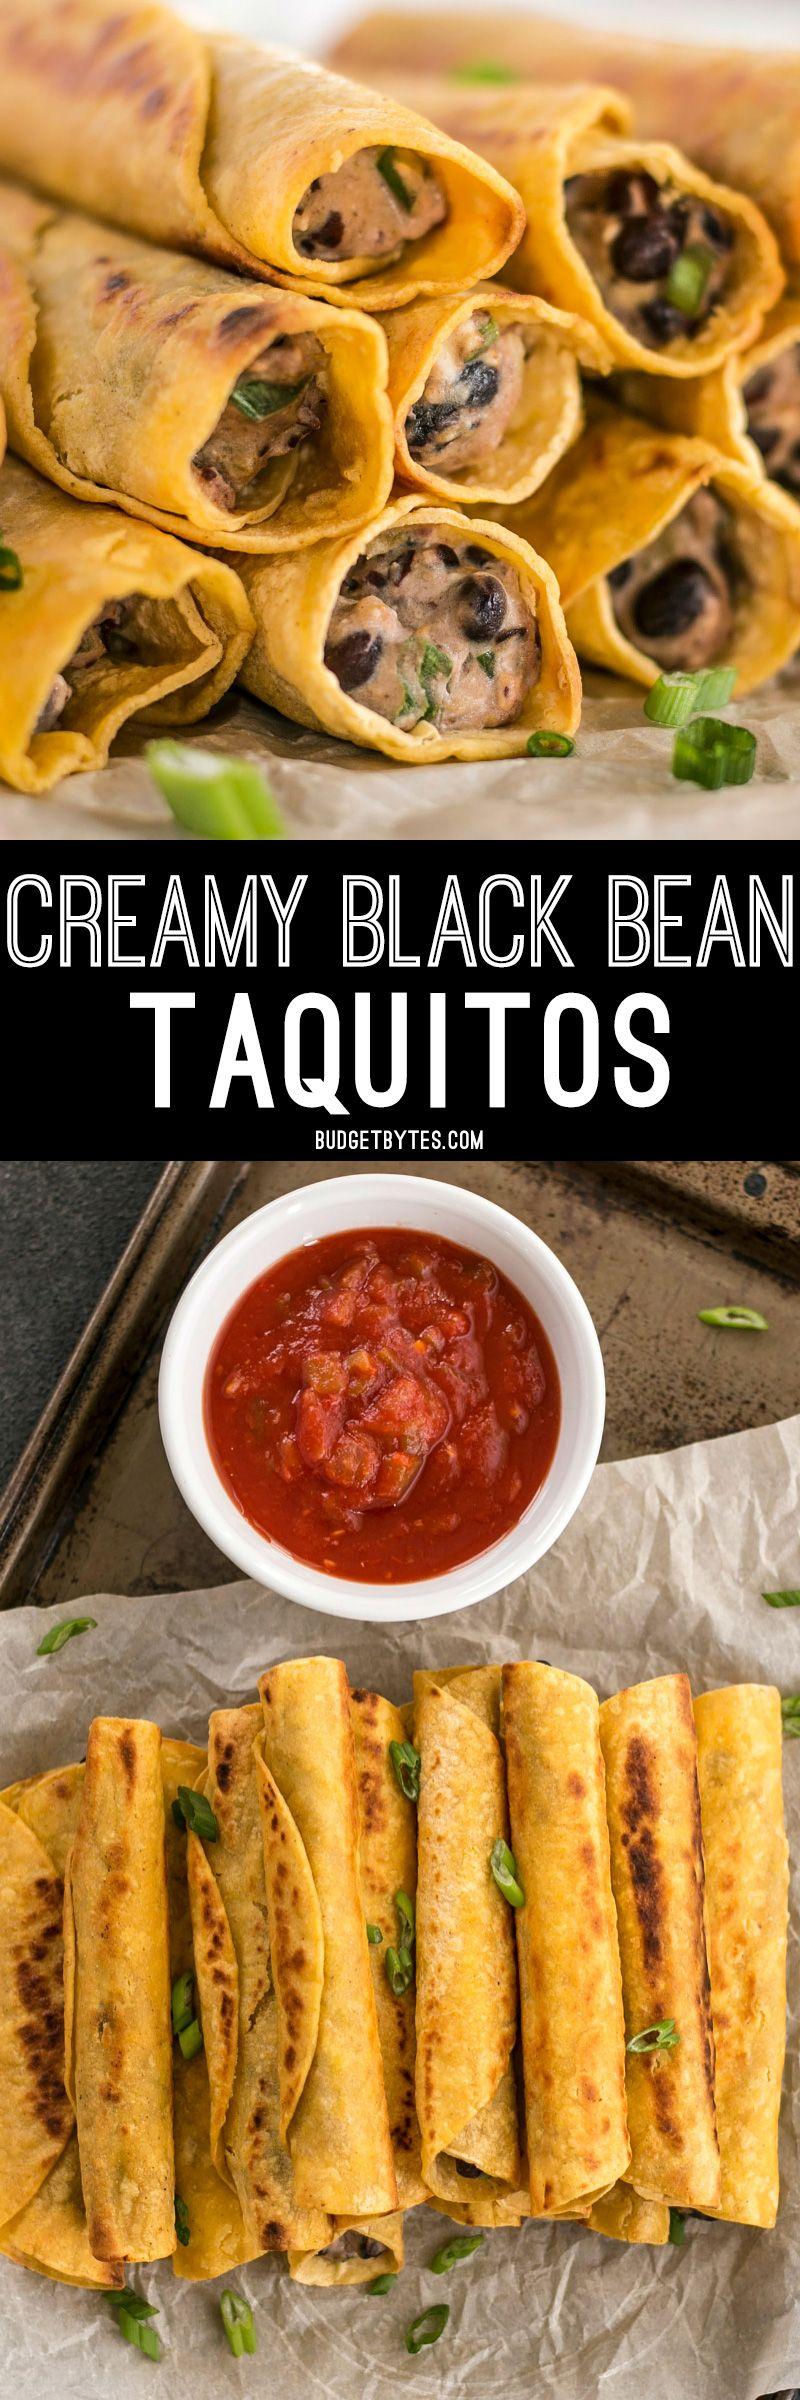 Creamy Black Bean Taquitos